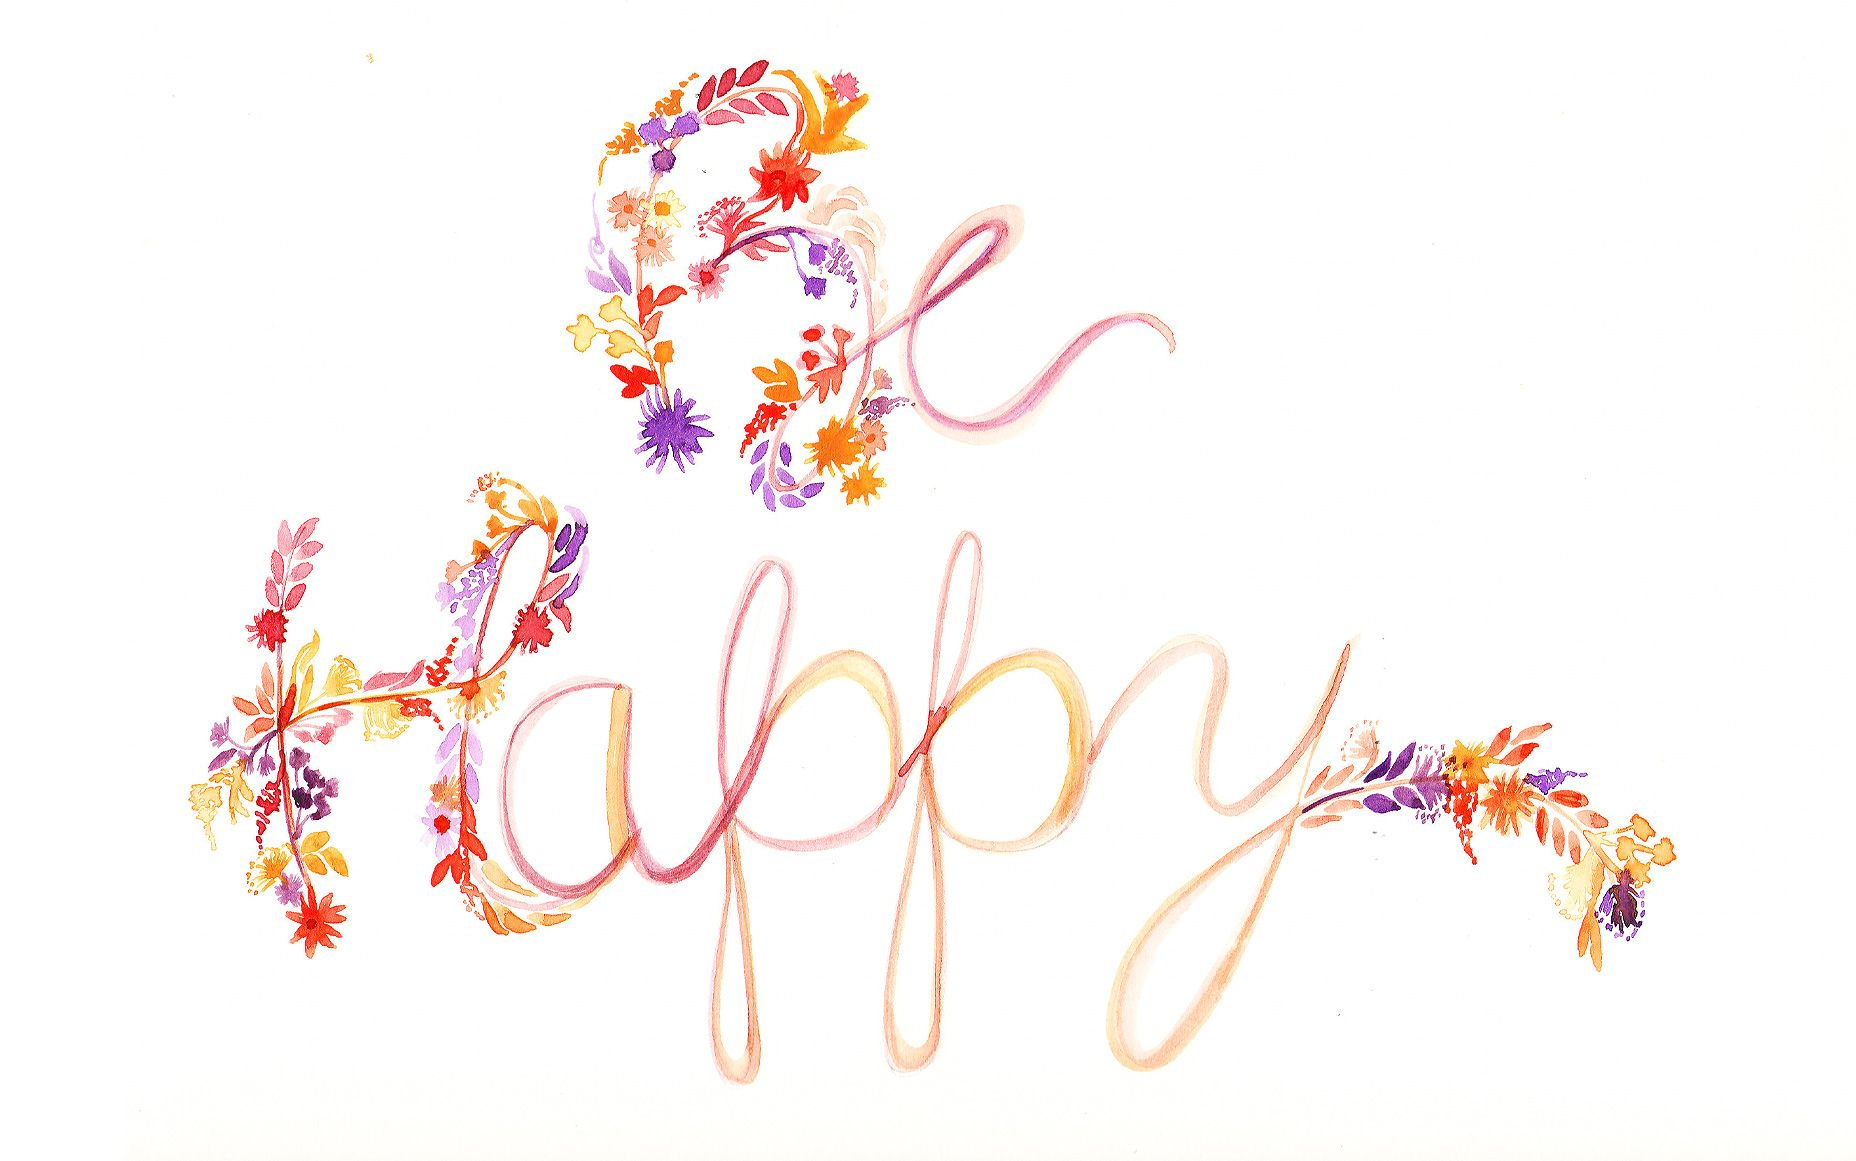 Lilac lavender floral be happy desktop wallpaper background  wallpapers  Pinterest  Wallpaper